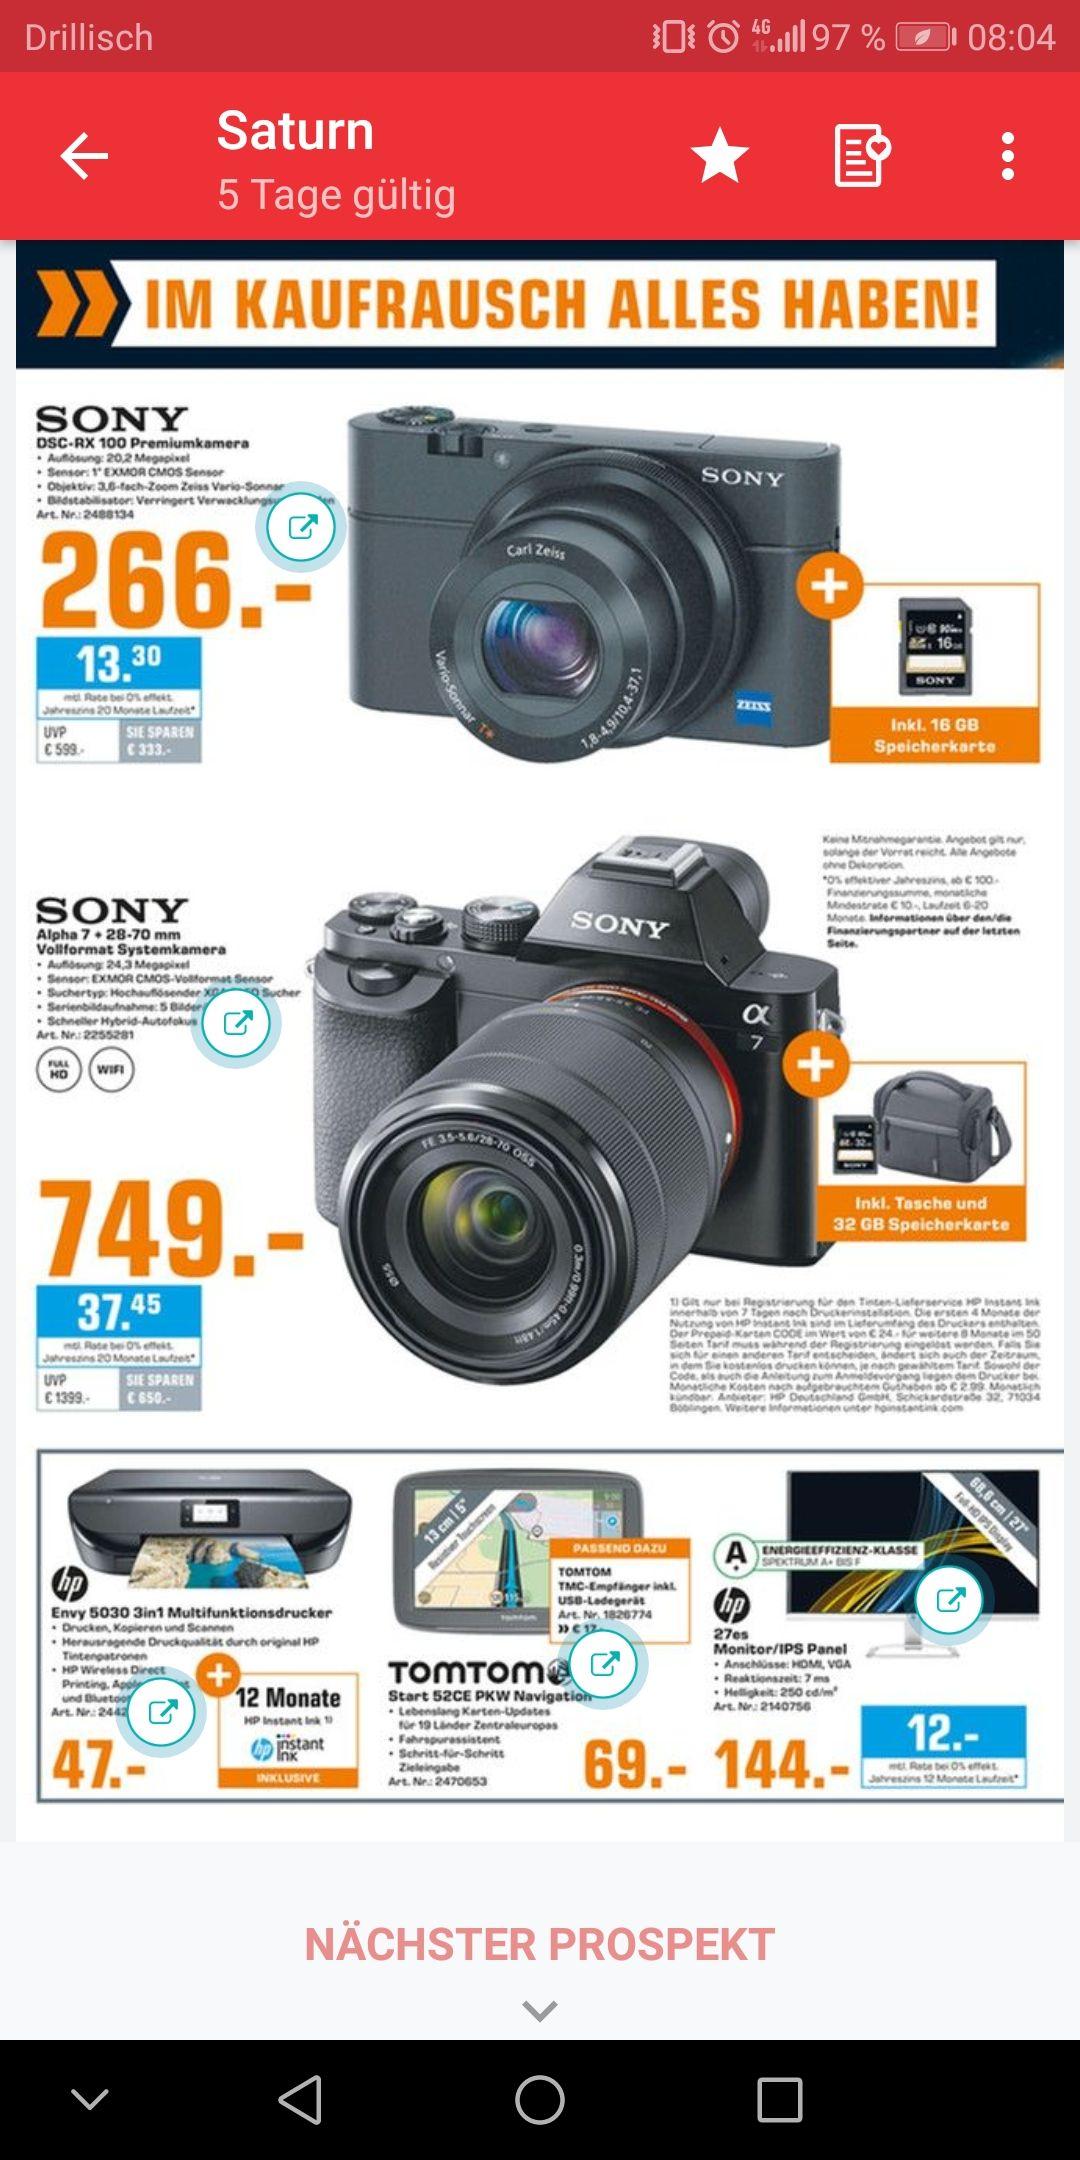 [Lokal] [Saturn Lübeck] Sony Alpha 7 Kit + Tasche & 32GB SD Karte